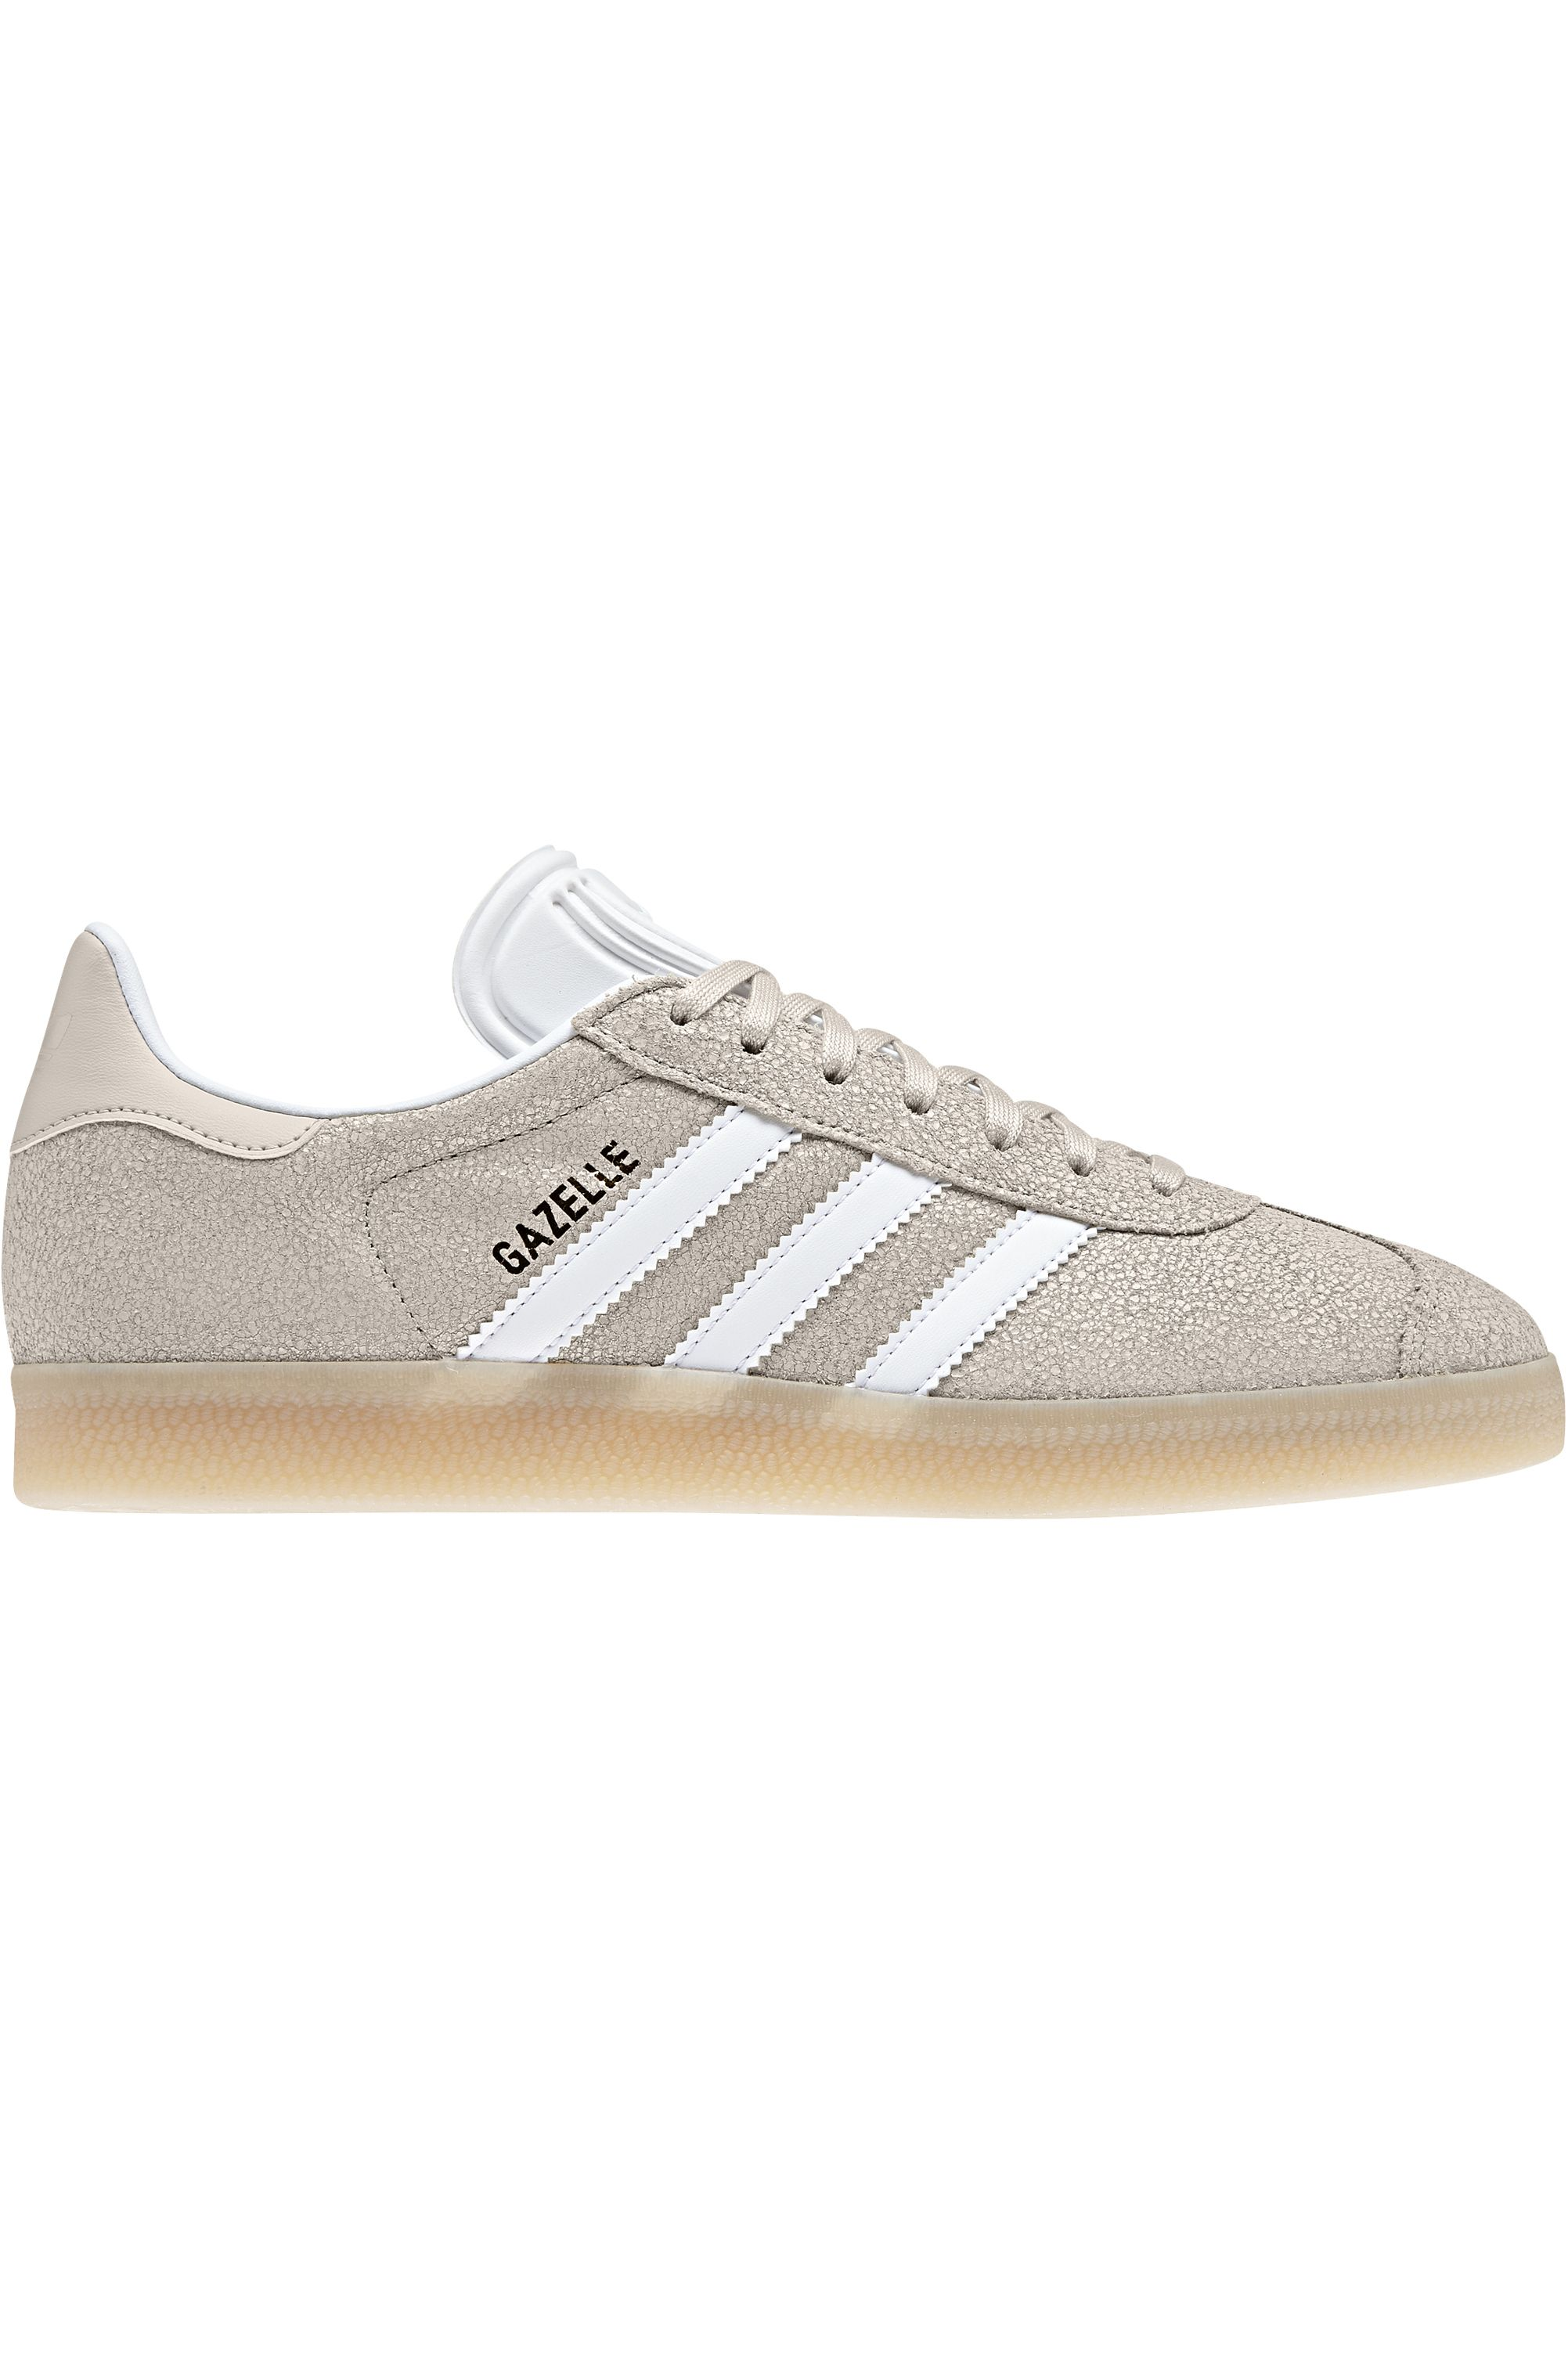 Tenis Adidas GAZELLE Clear Brown/Ftwr White/Ecru Tint S18